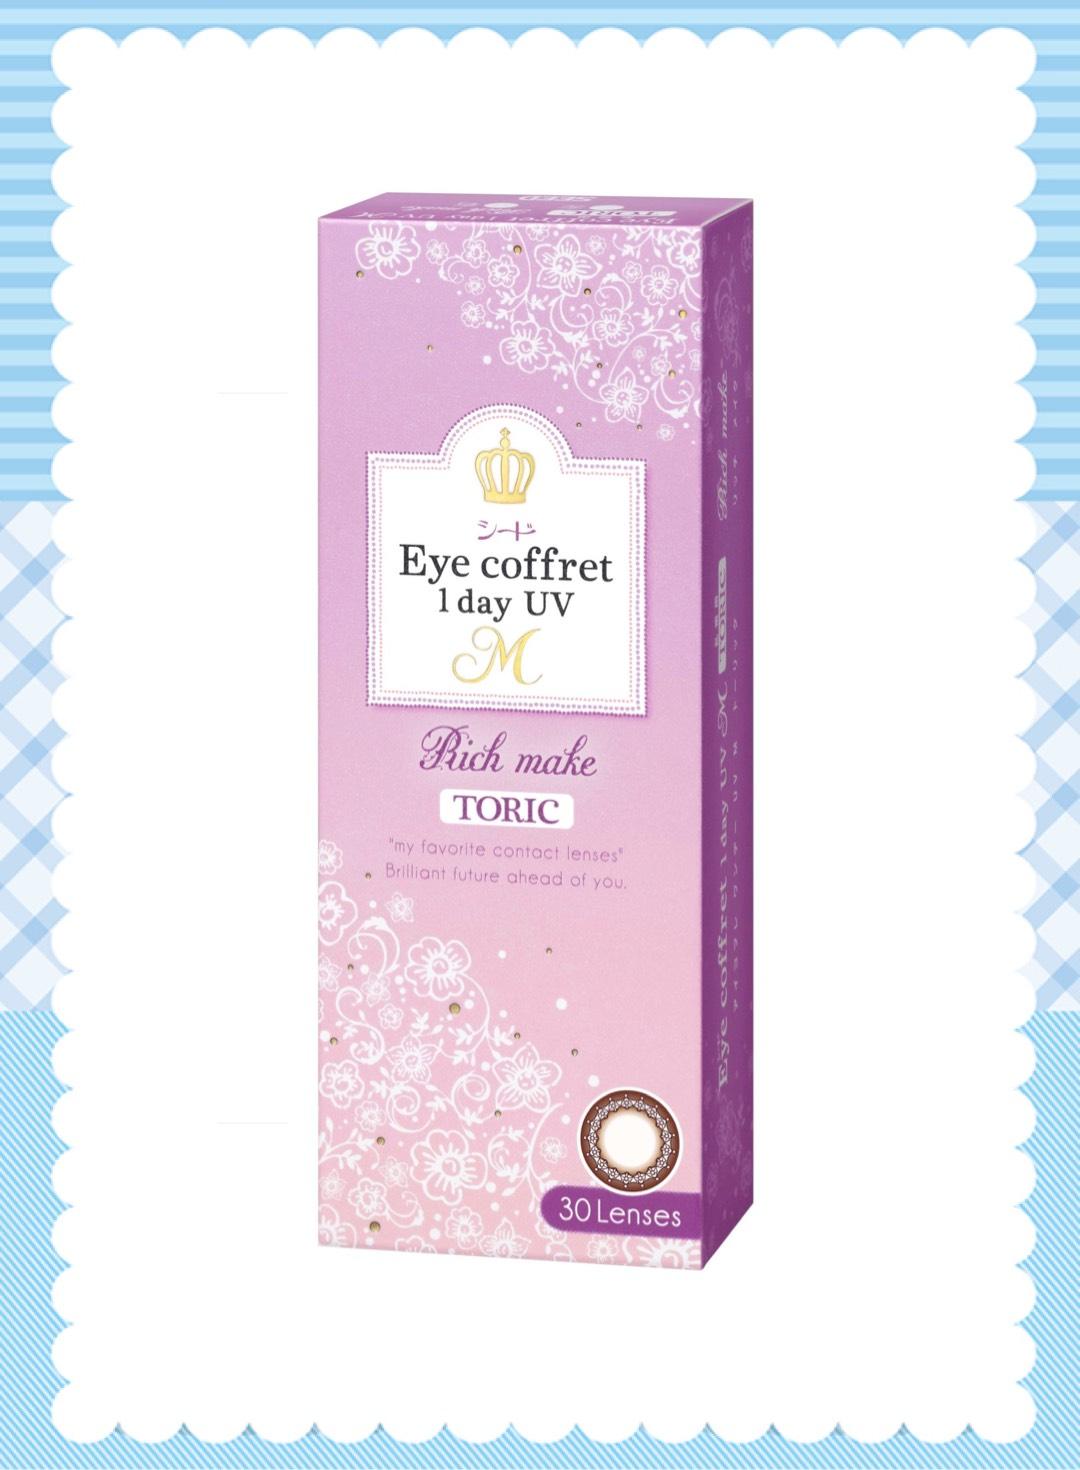 Eye coffret 1day UV-Mトーリック